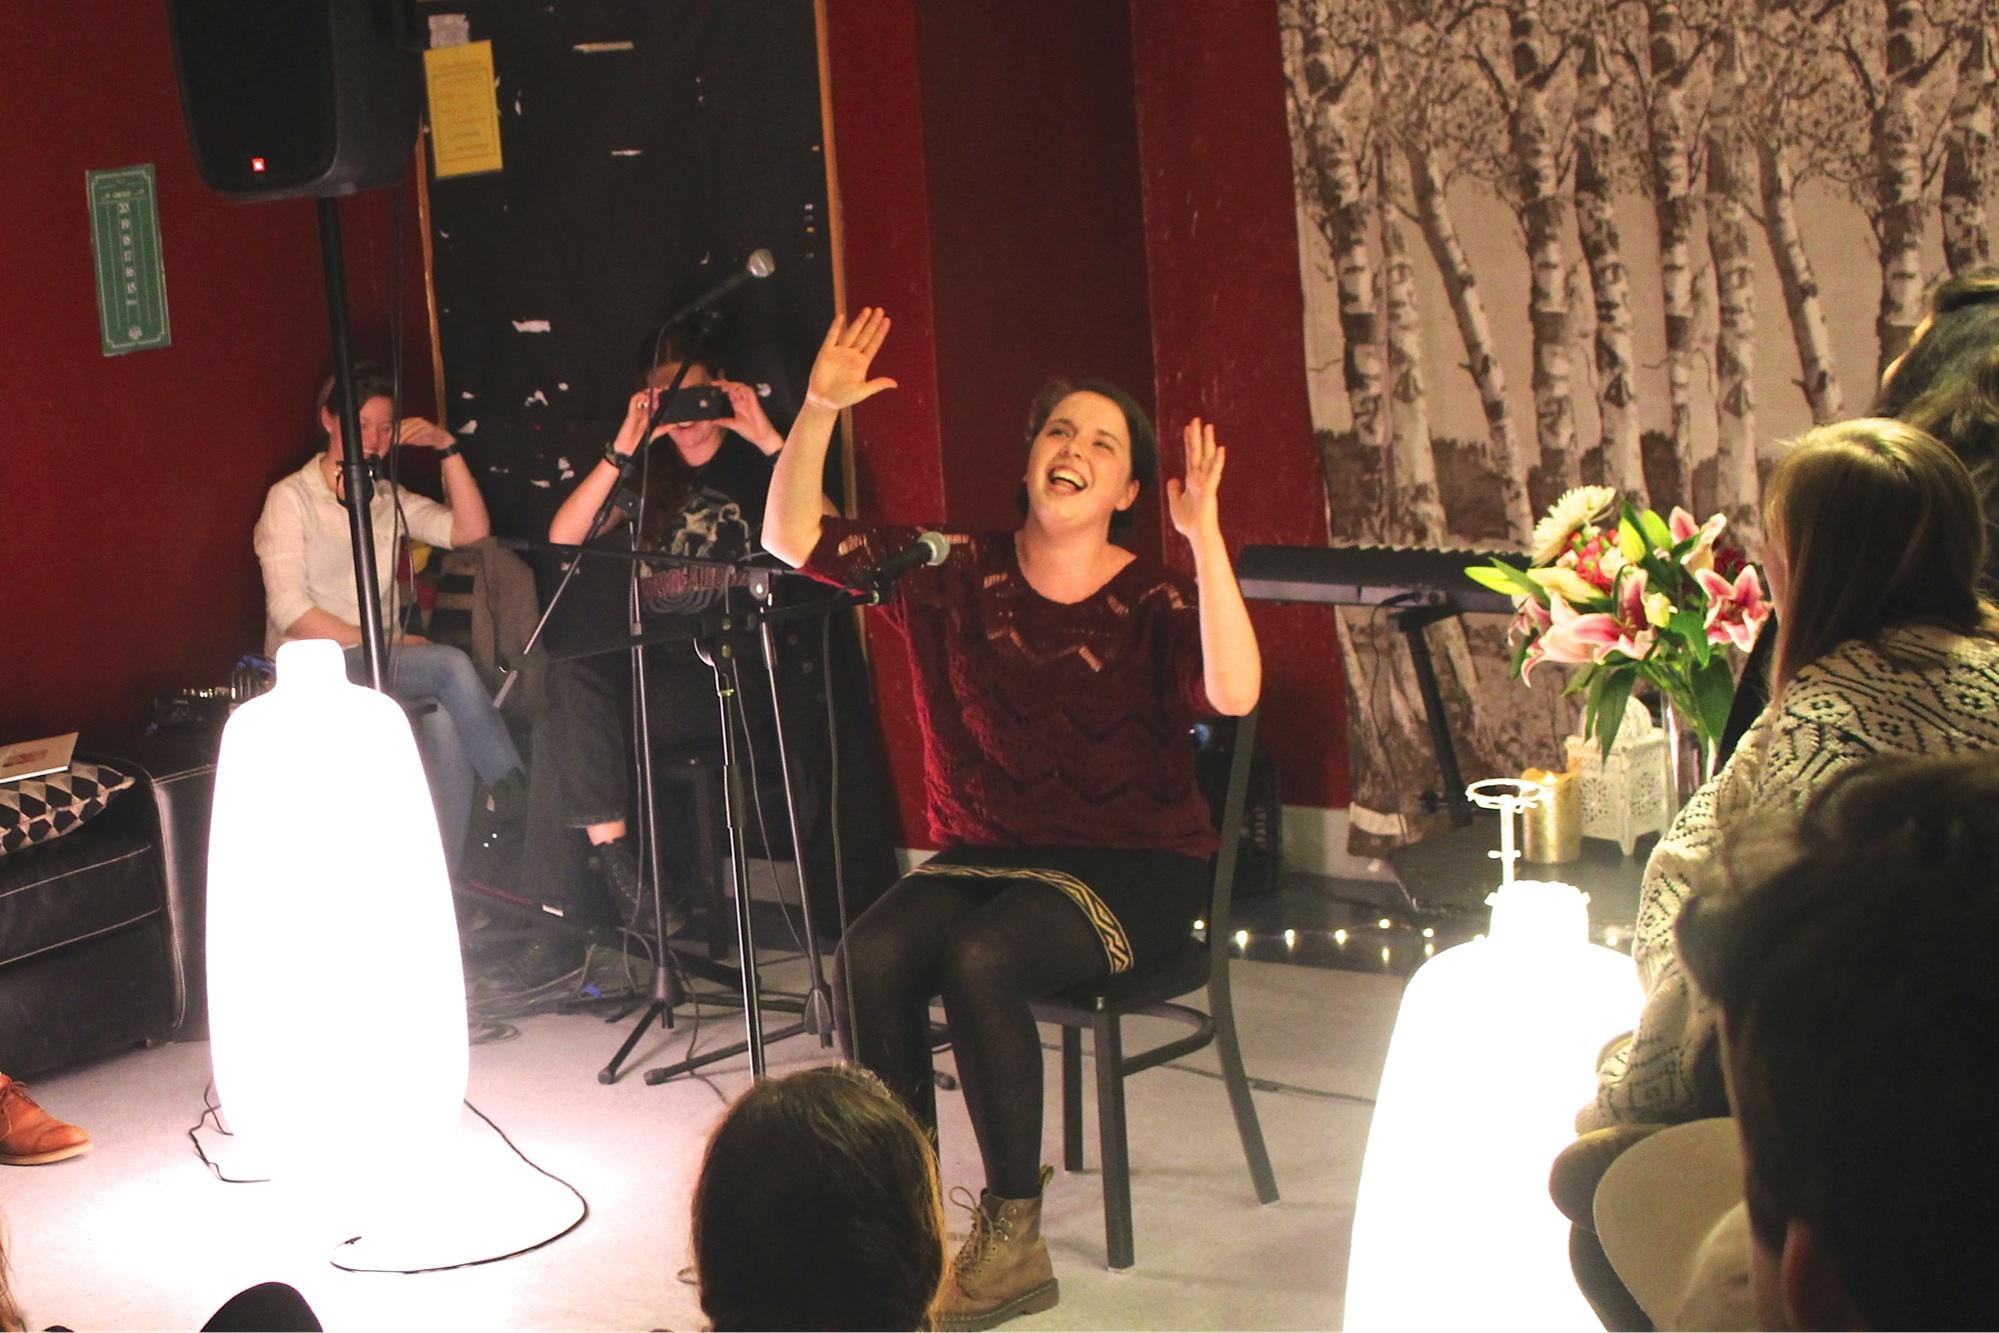 Megan Gilbs leads a rousing, sing-along rendition of Bohemian Rhapsody